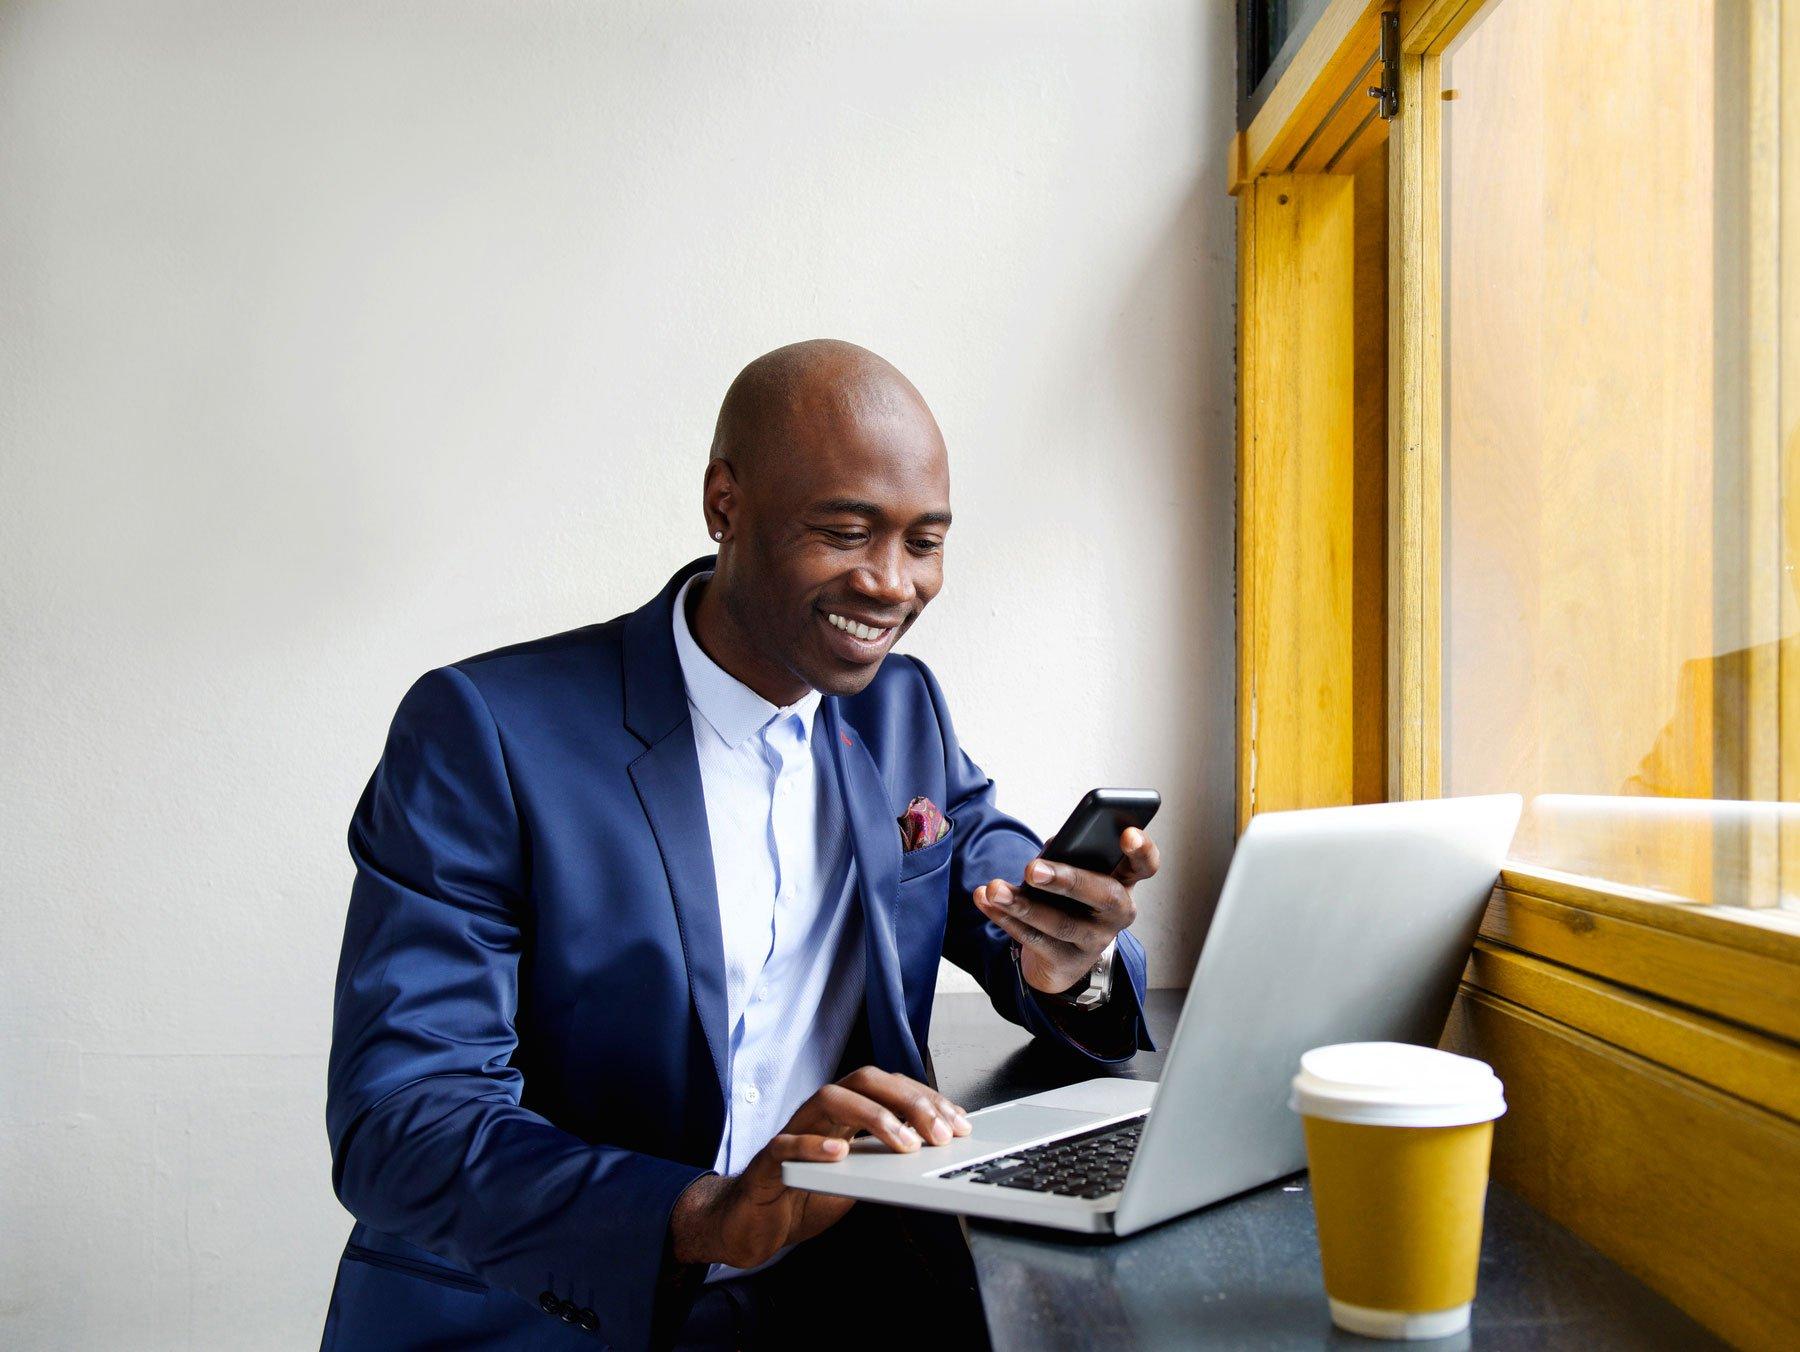 african_american_man_mobile_phone_laptop